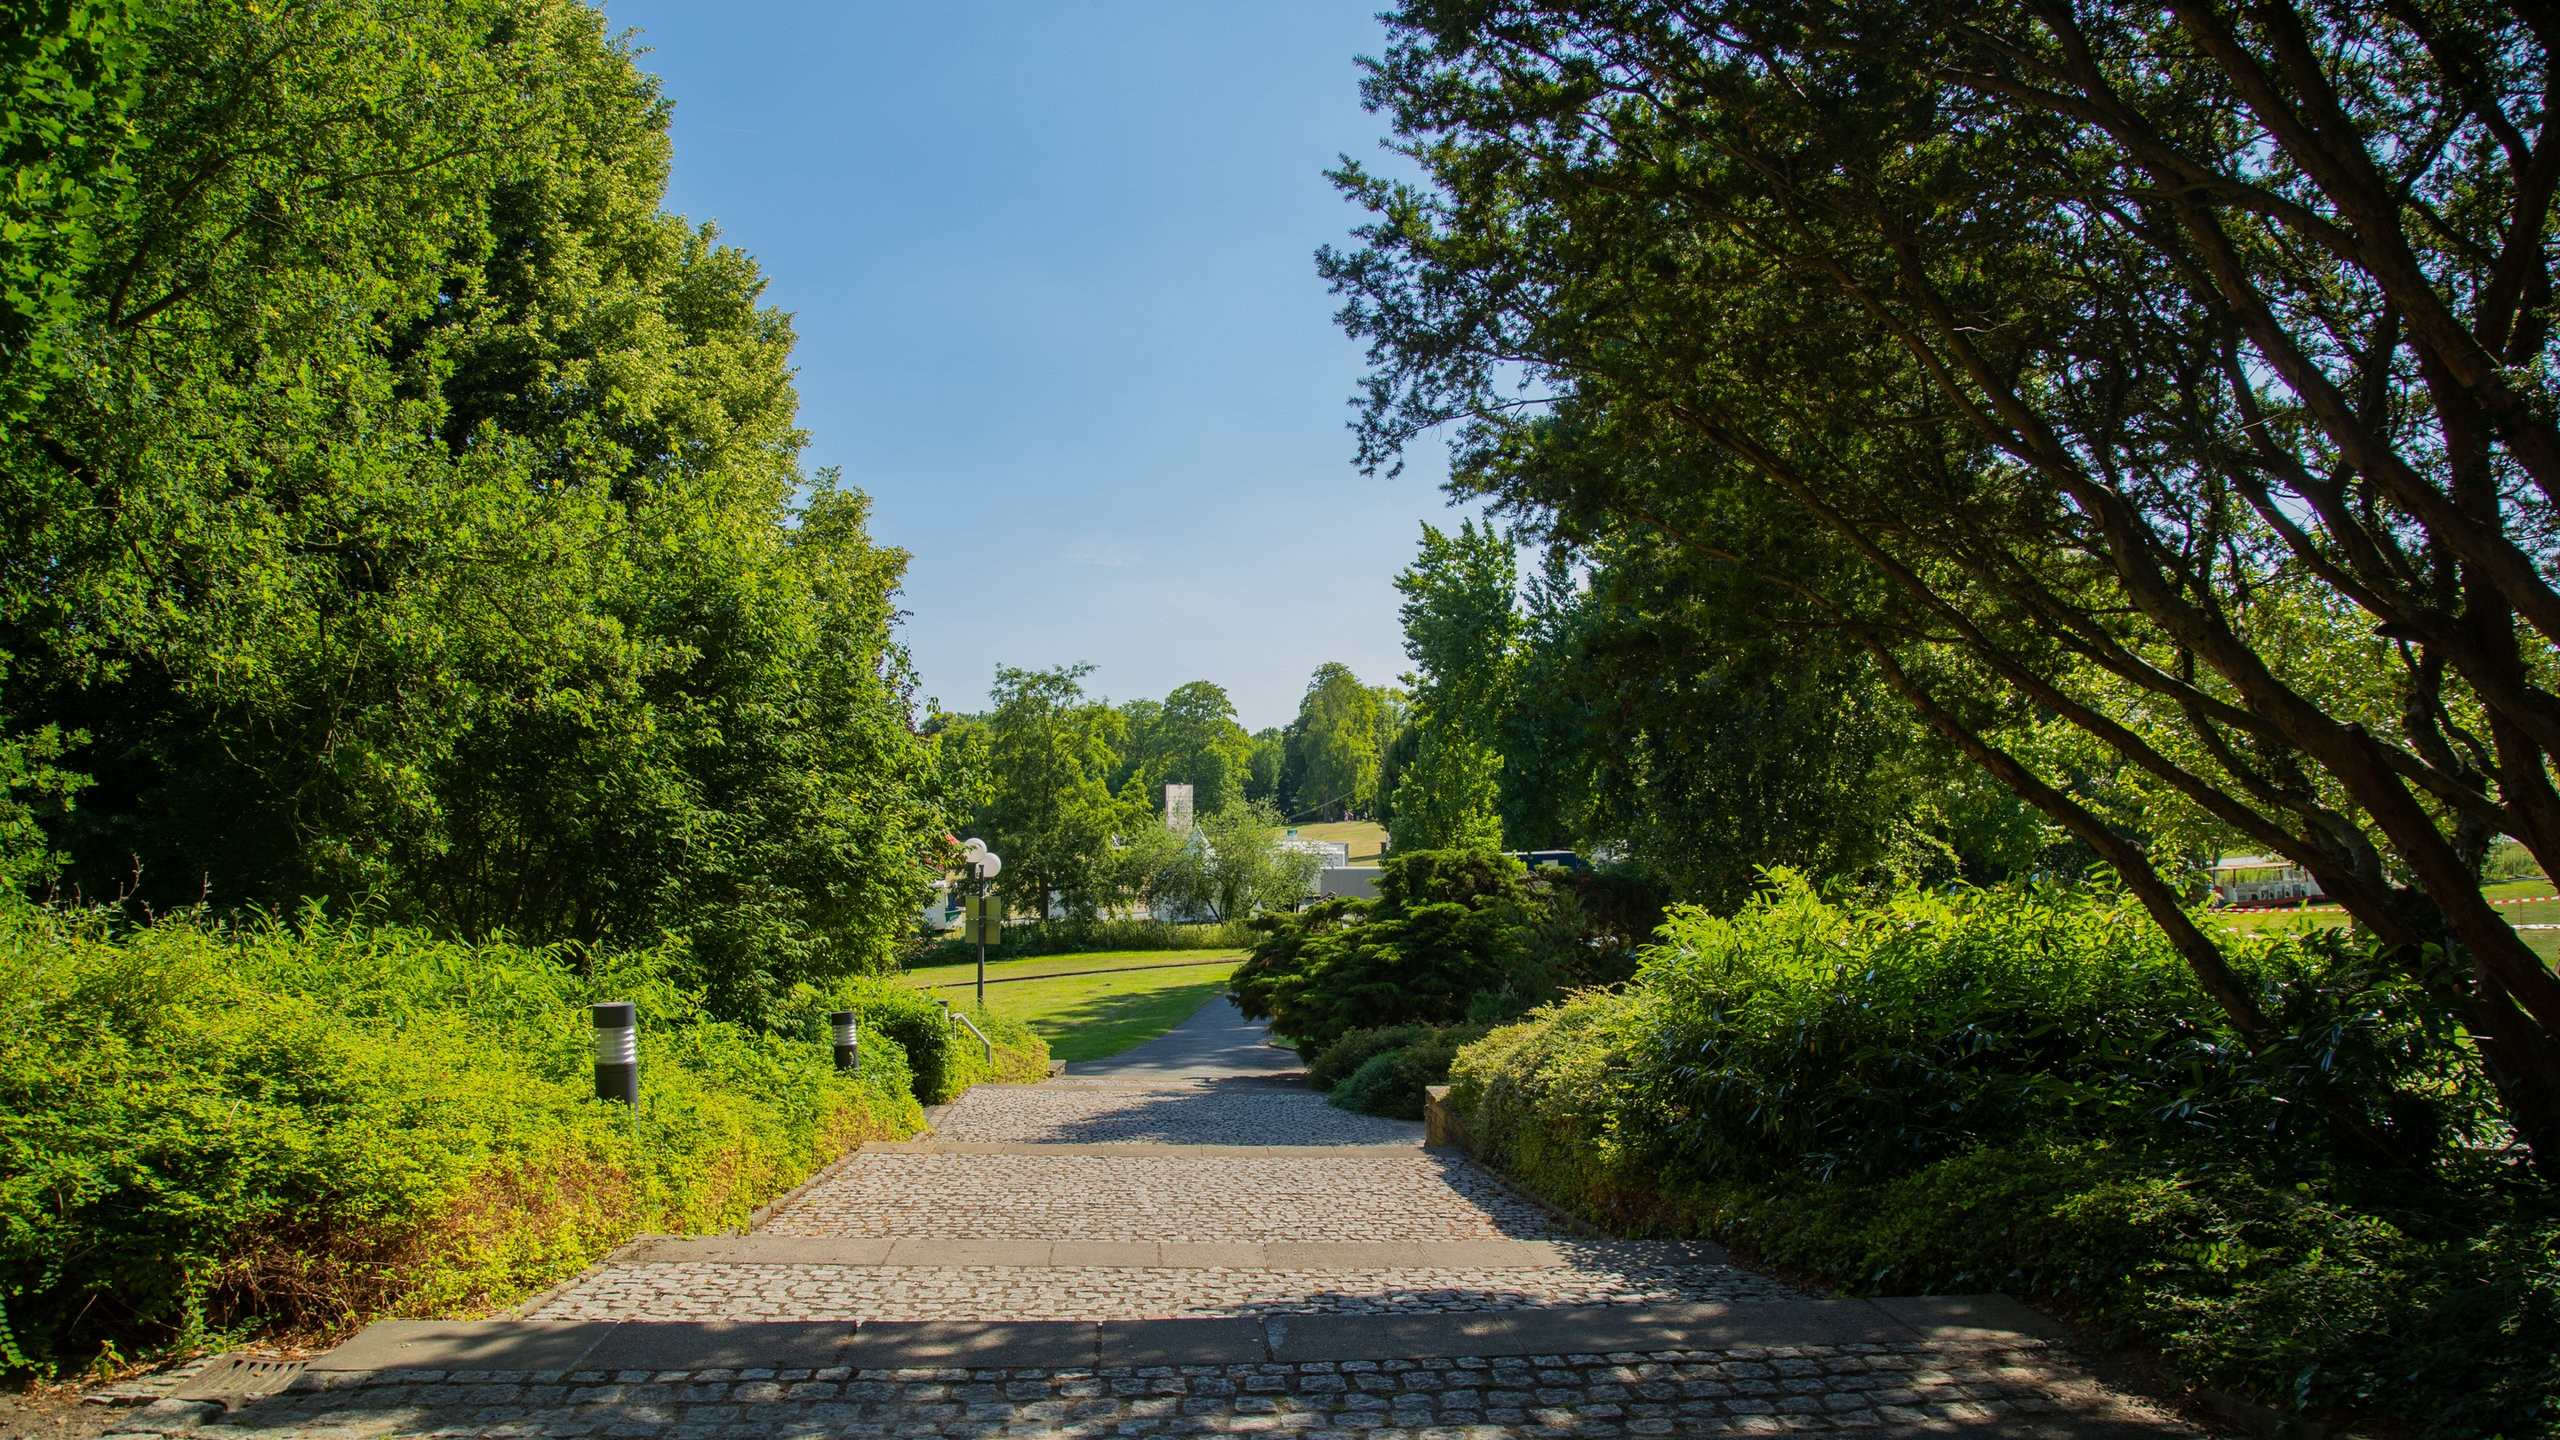 Parc Westfalenpark Dortmund, Dortmund, Rhénanie-du-Nord-Westphalie, Allemagne